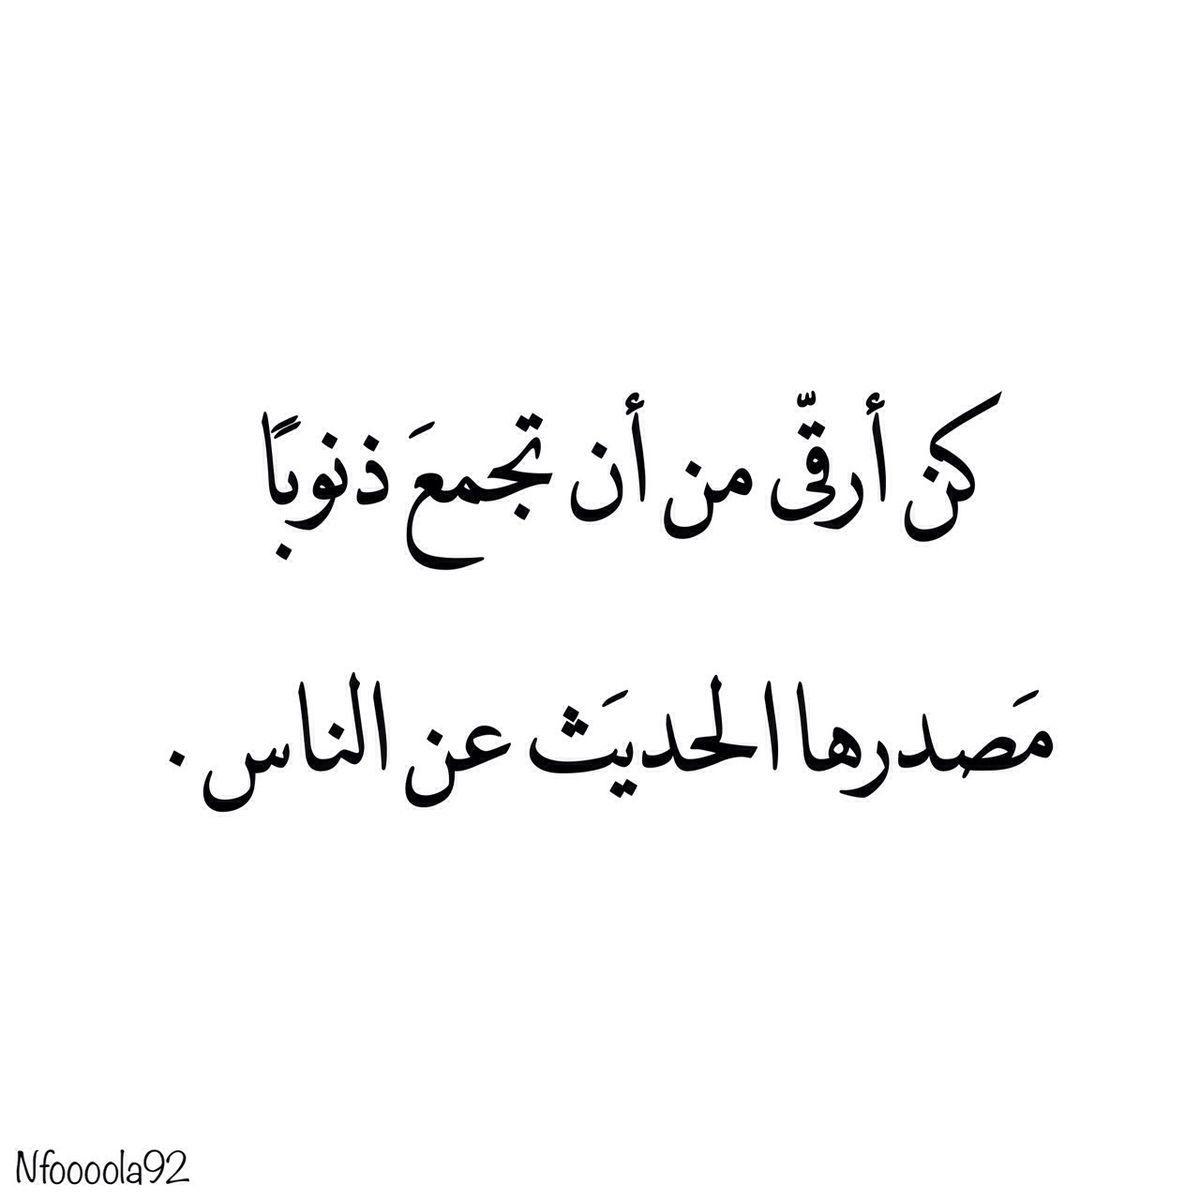 كلام الناس Words Quotes Talking Quotes Funny Arabic Quotes